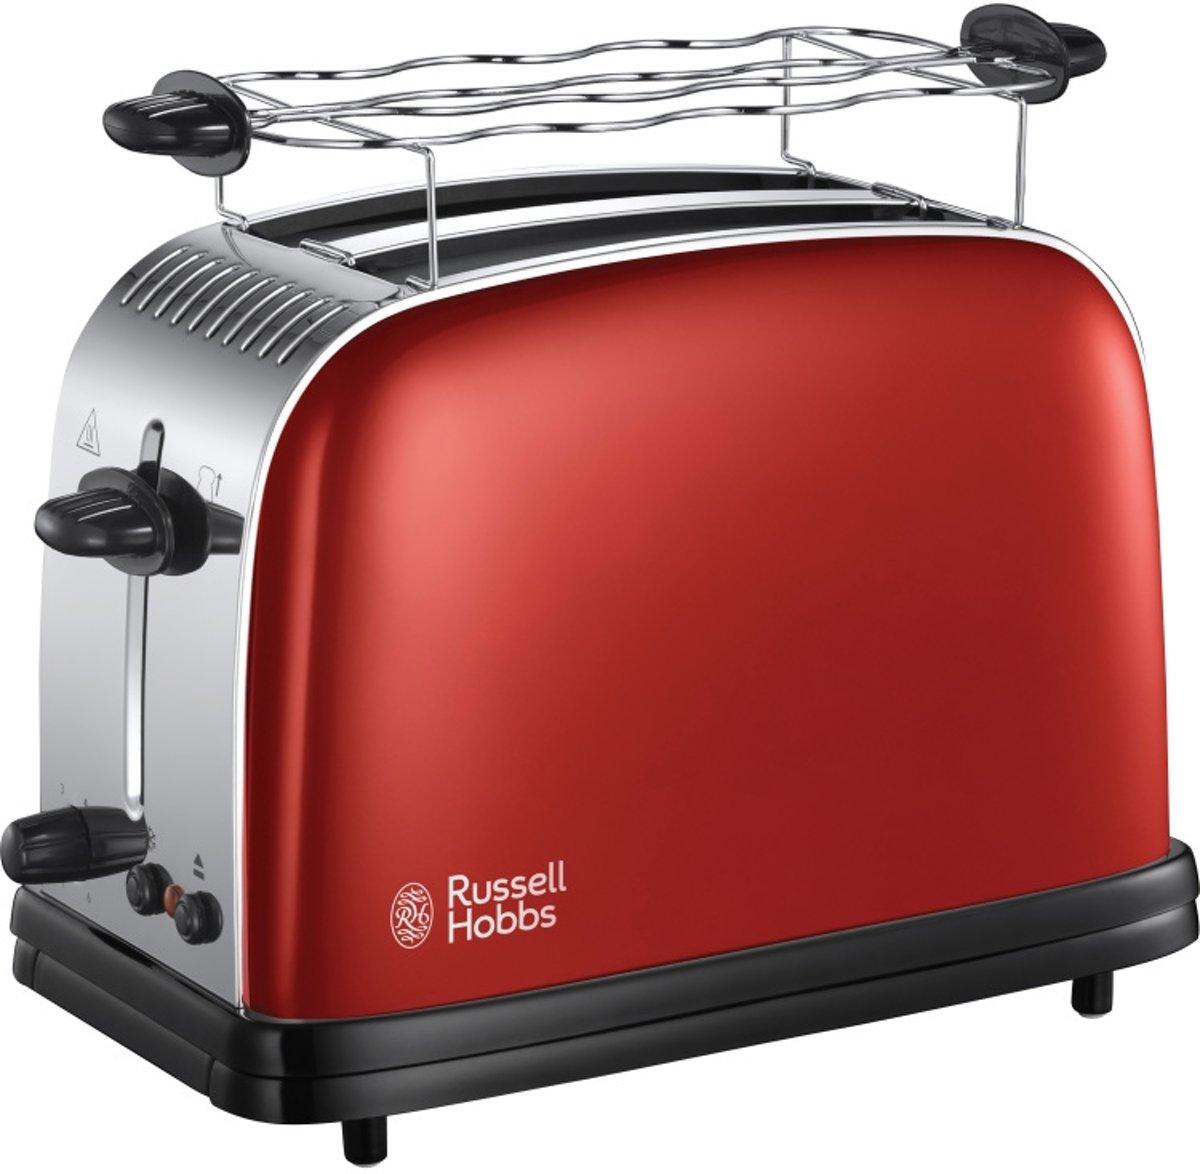 Prăjitor de pâine Russell Hobbs